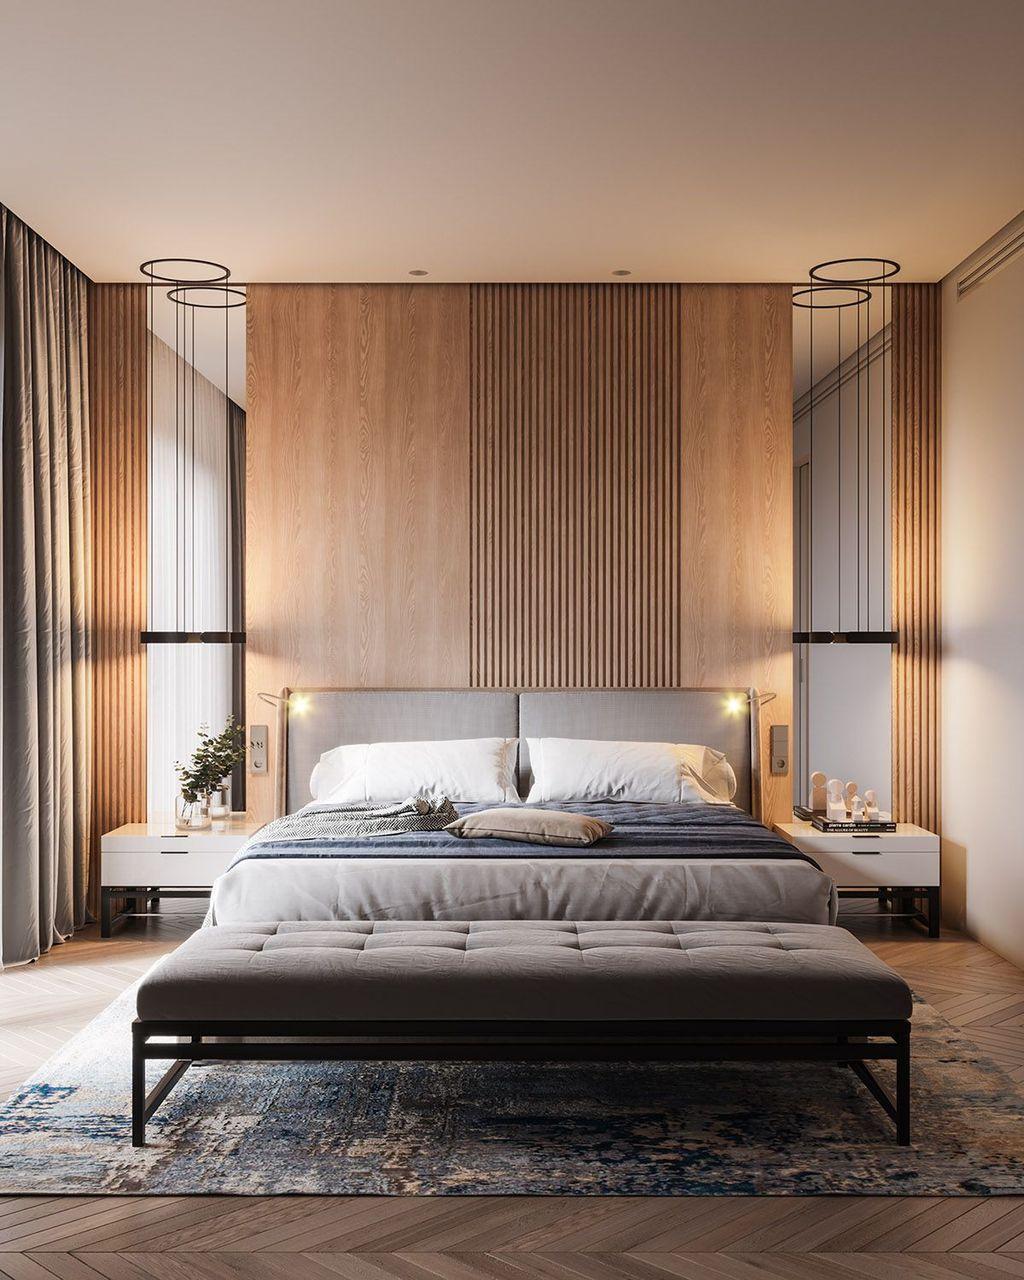 20 Luxury Bedroom Design Ideas To Inspire You Trenduhome Luxurious Bedrooms Modern Bedroom Bedroom Design Bedroom interior design examples